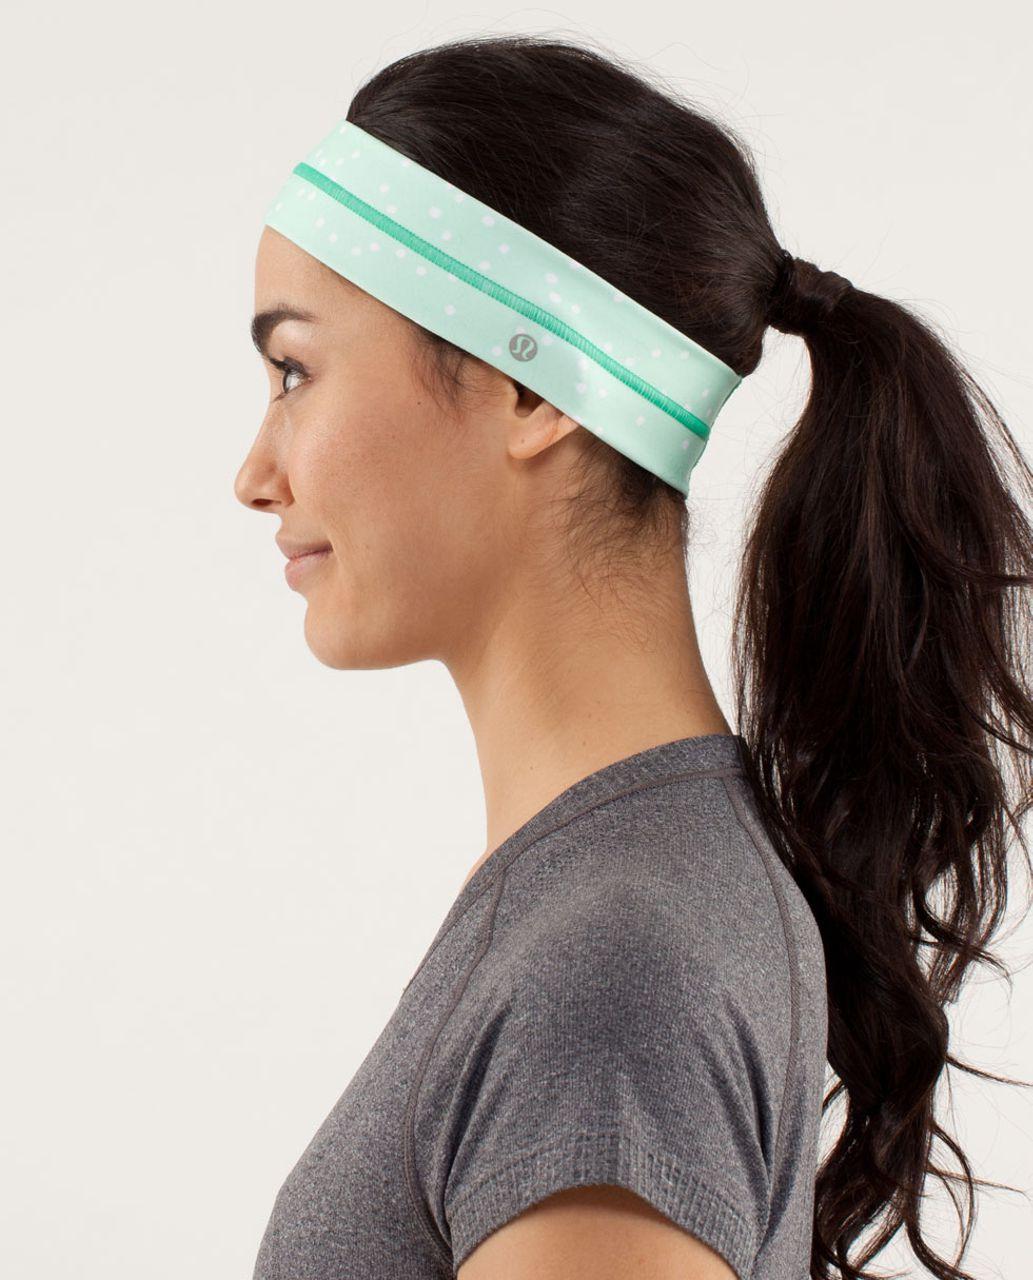 Lululemon Fly Away Tamer Headband - Petit Dot Fresh Teal